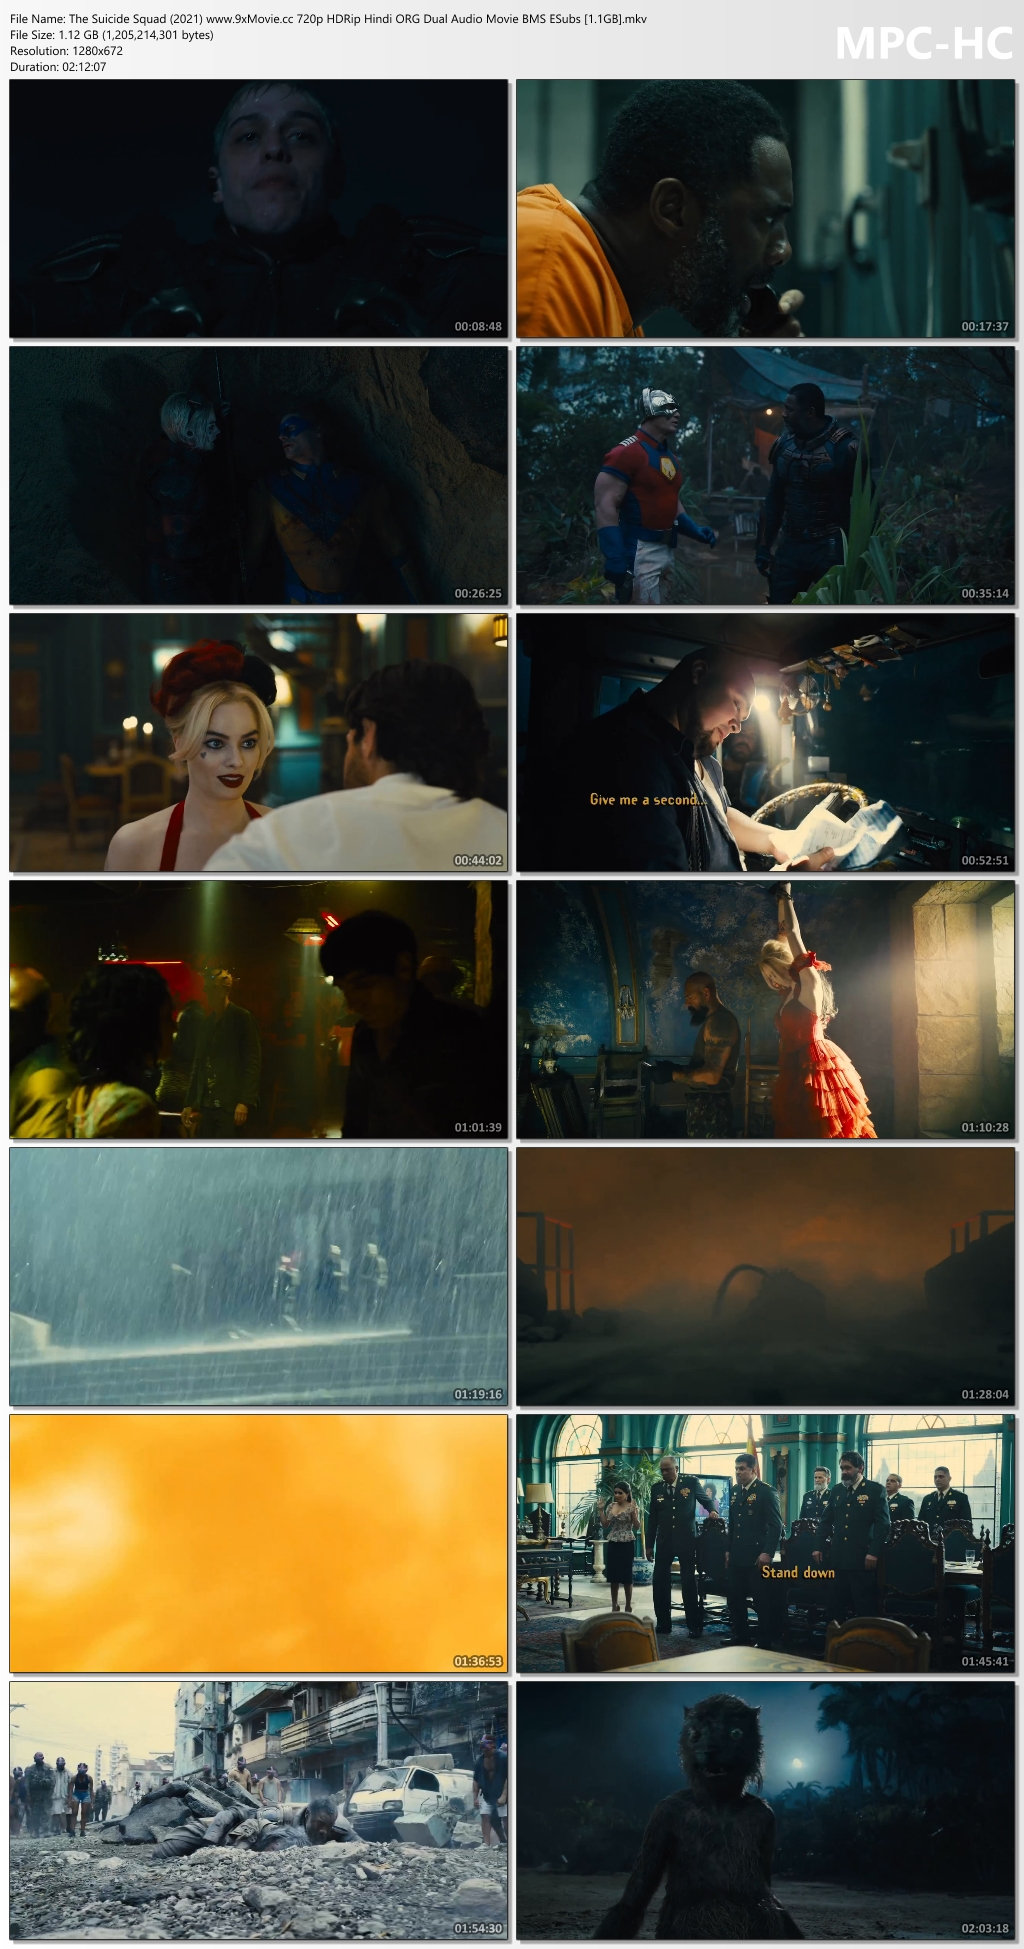 The-Suicide-Squad-2021-www-9x-Movie-cc-720p-HDRip-Hindi-ORG-Dual-Audio-Movie-BMS-ESubs-1-1-GB-mkv